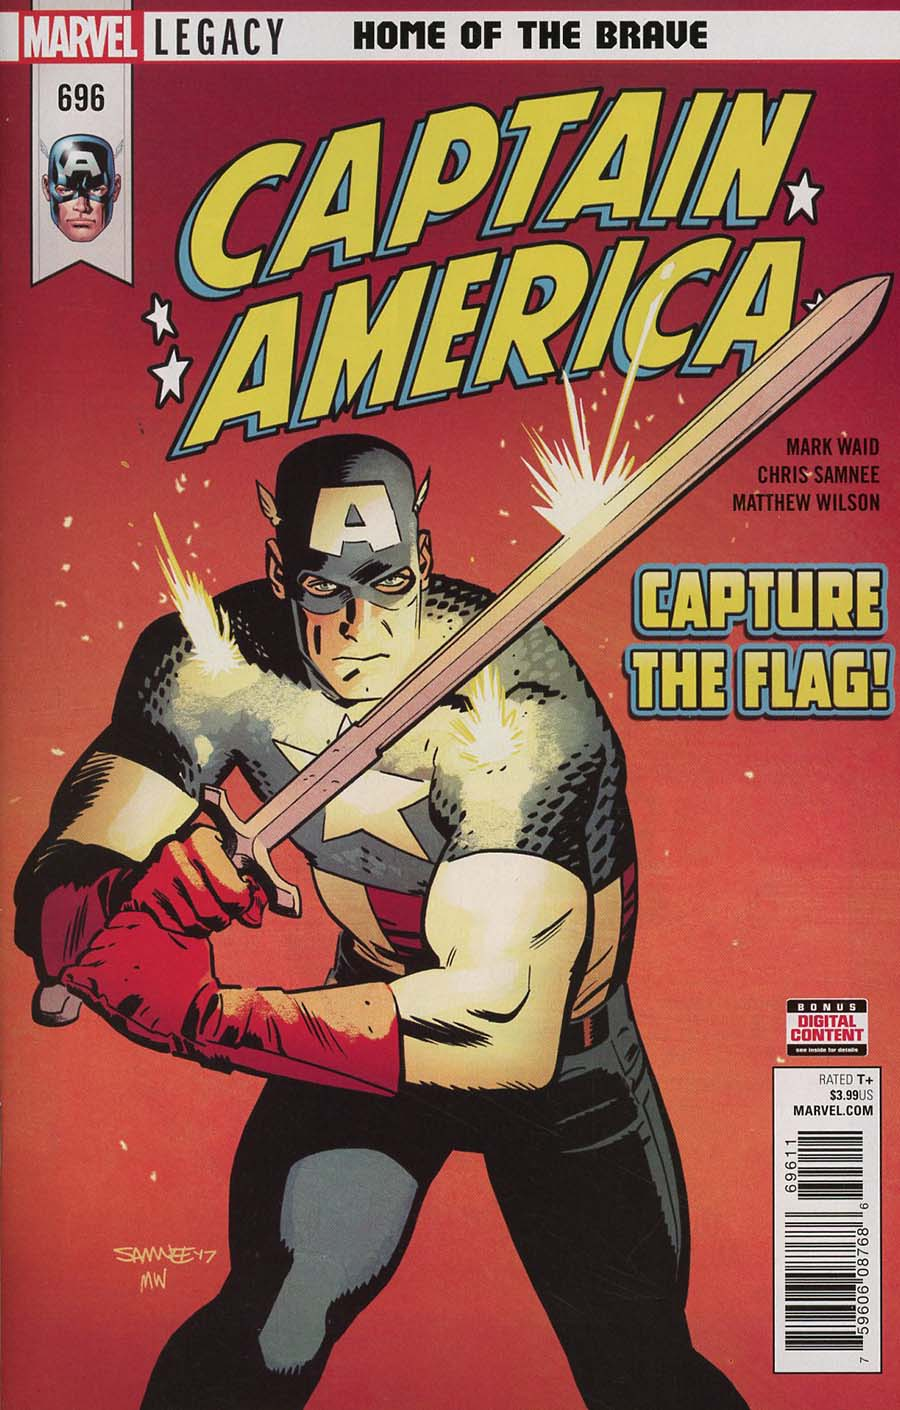 Captain America Vol 8 #696 Cover A 1st Ptg Regular Chris Samnee Cover (Marvel Legacy Tie-In)